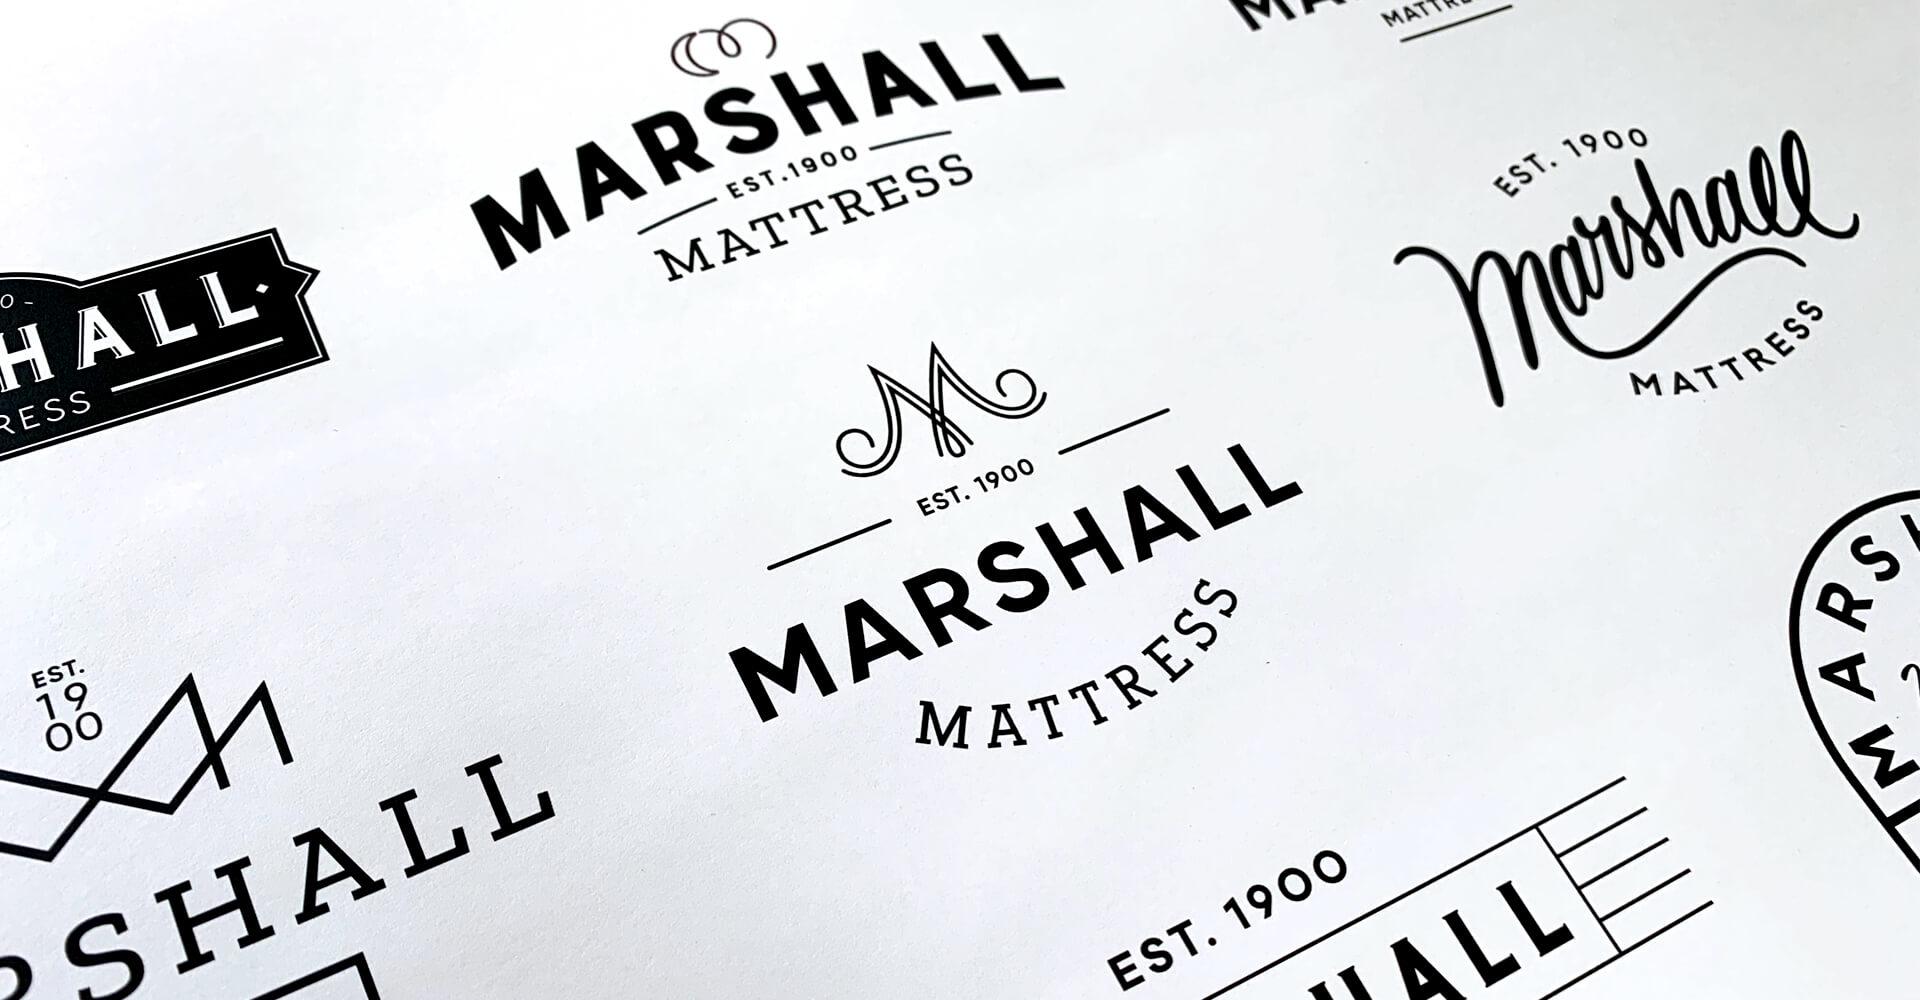 Marshall Mattress